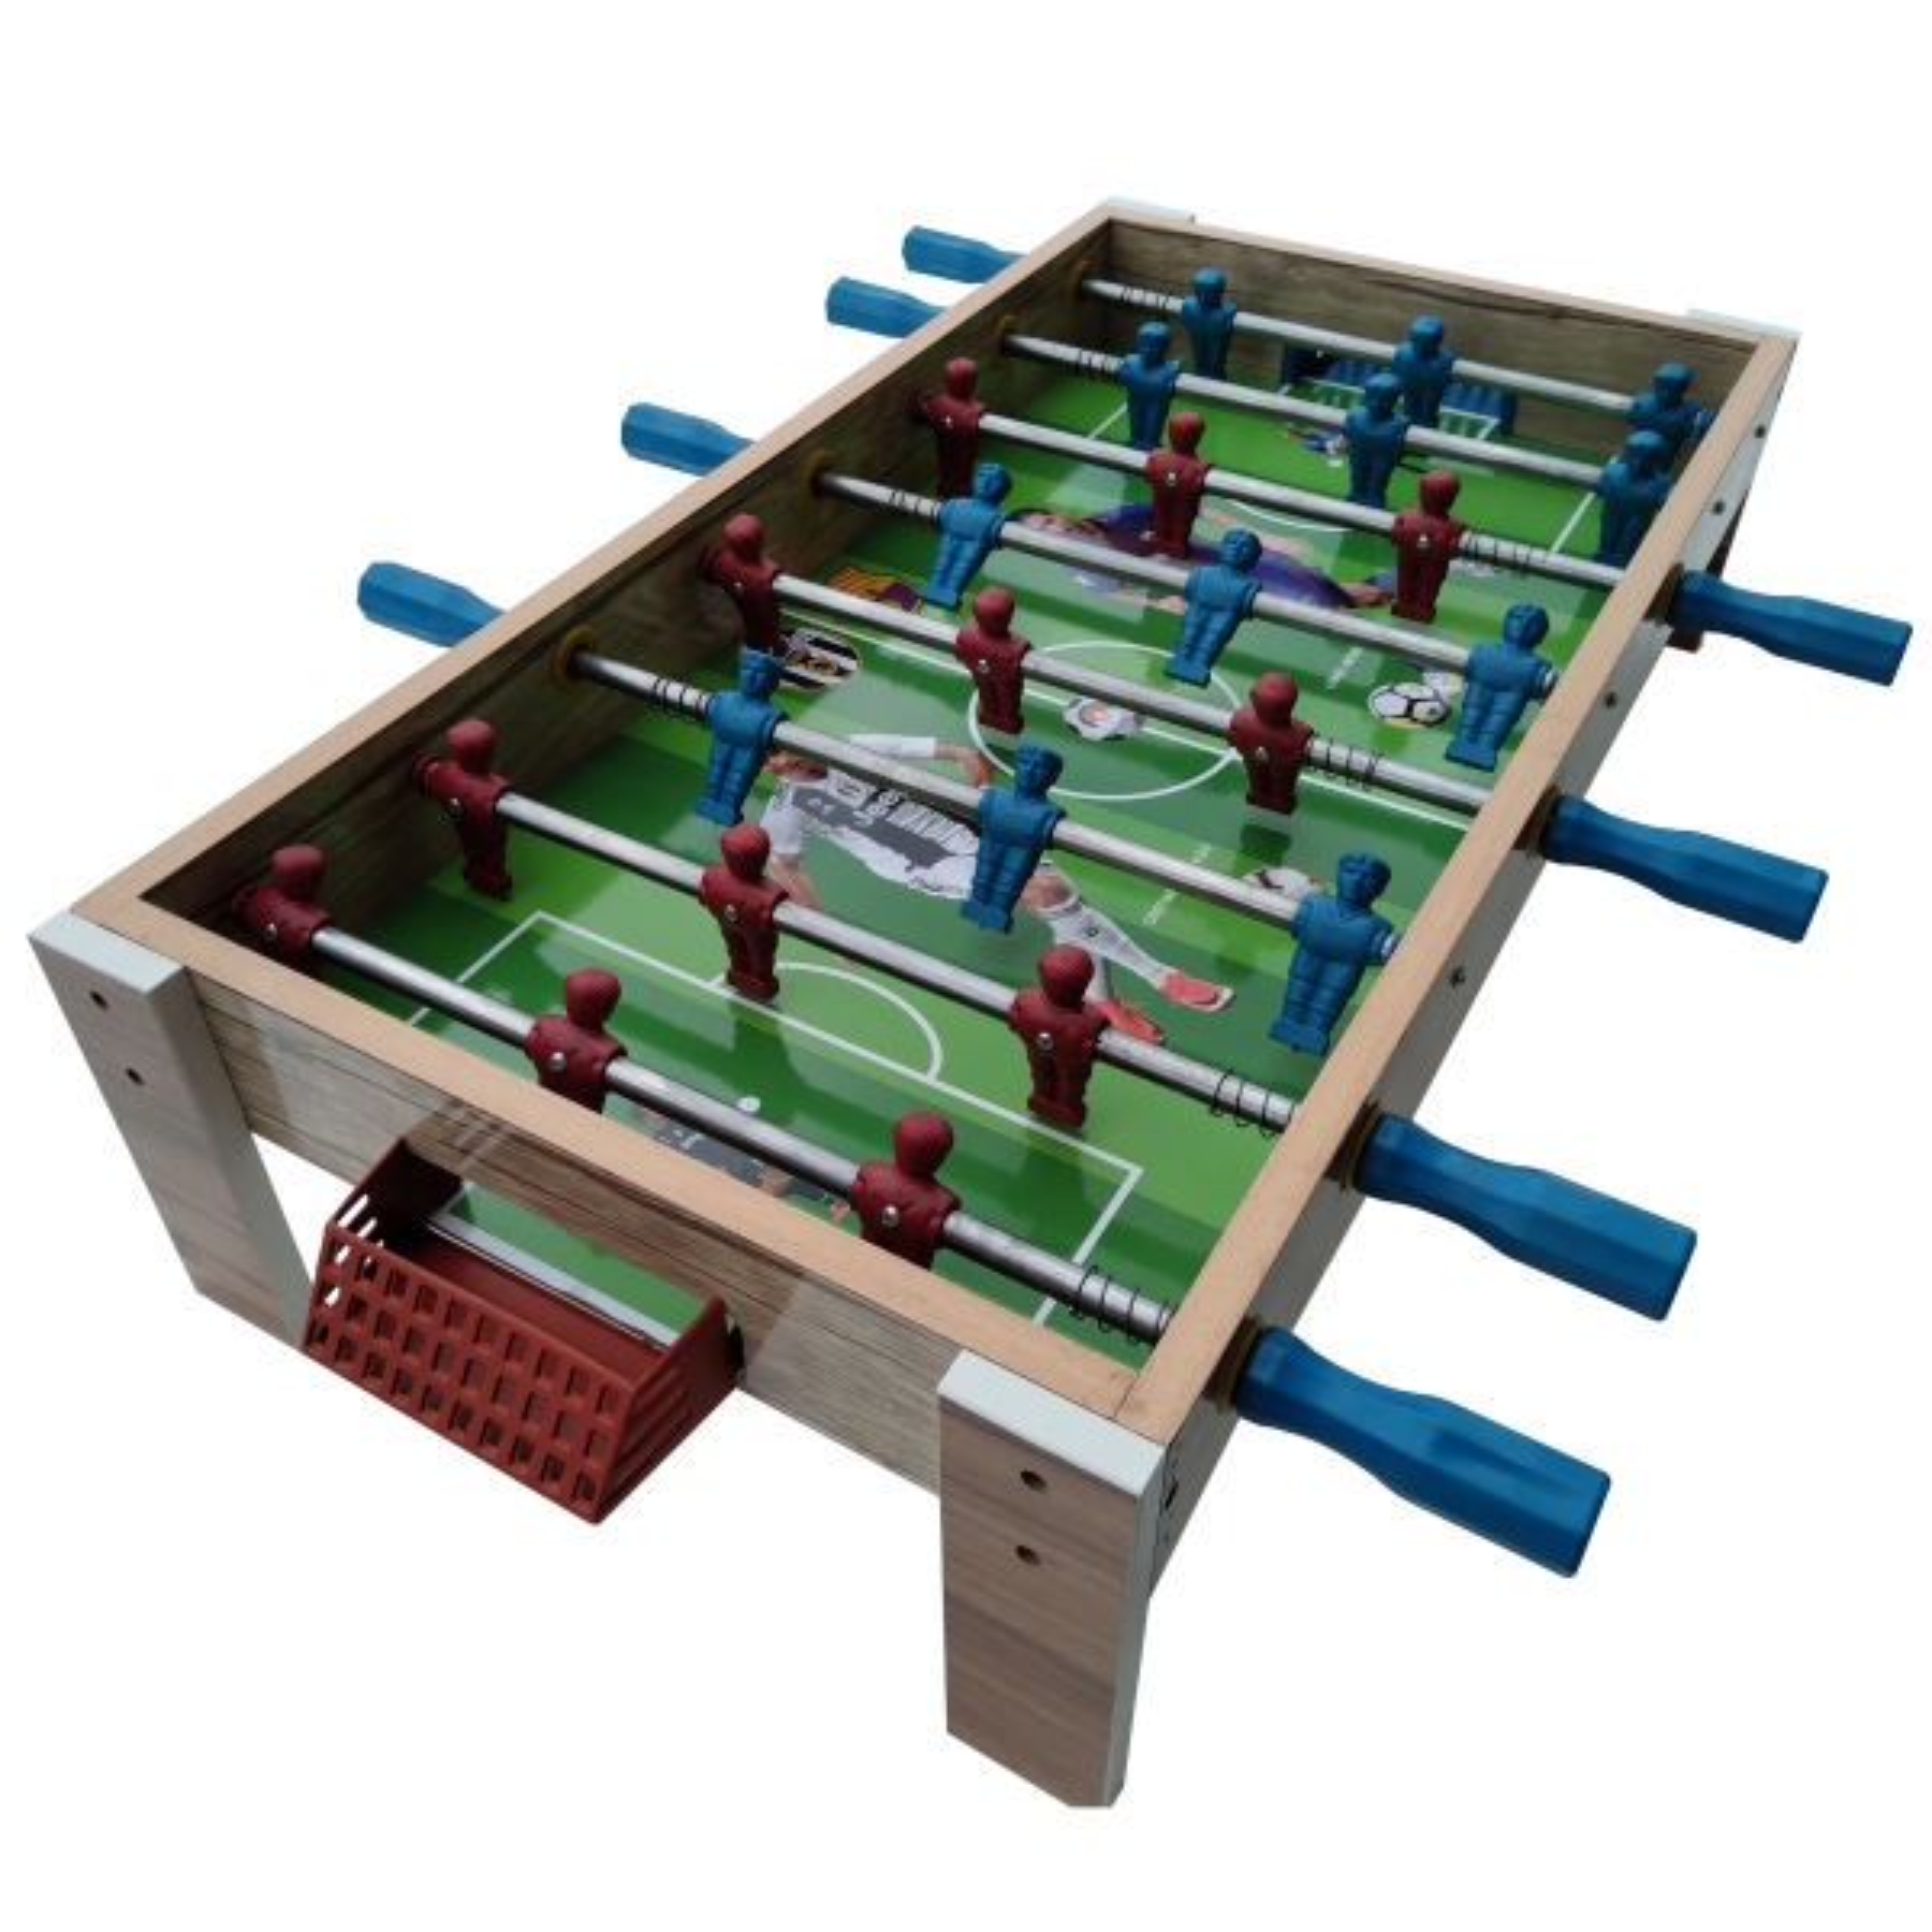 فوتبال دستی مدل 8M-4PCH